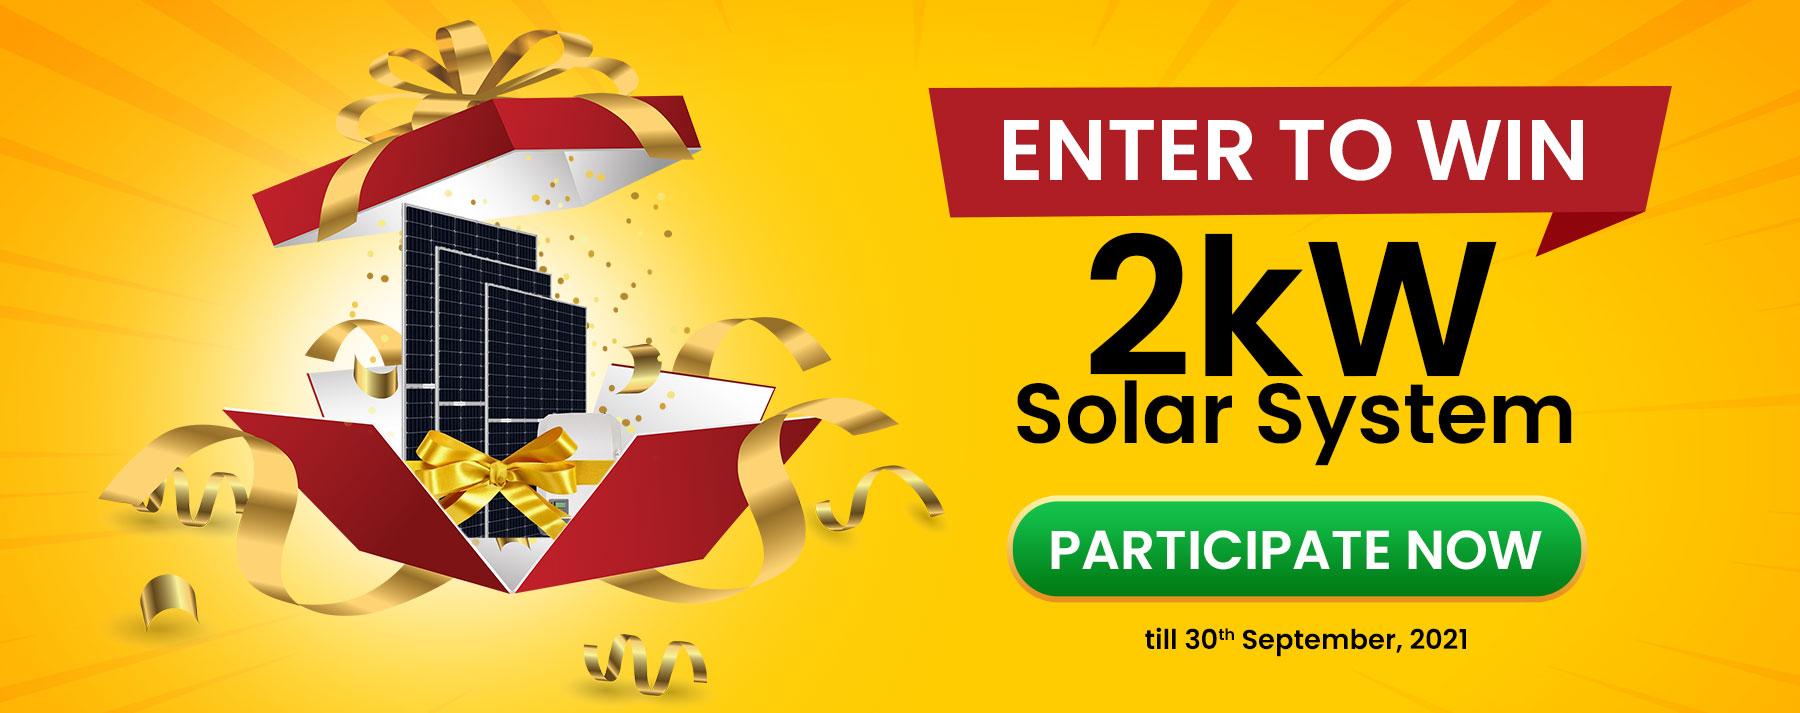 Win 2kW Solar System